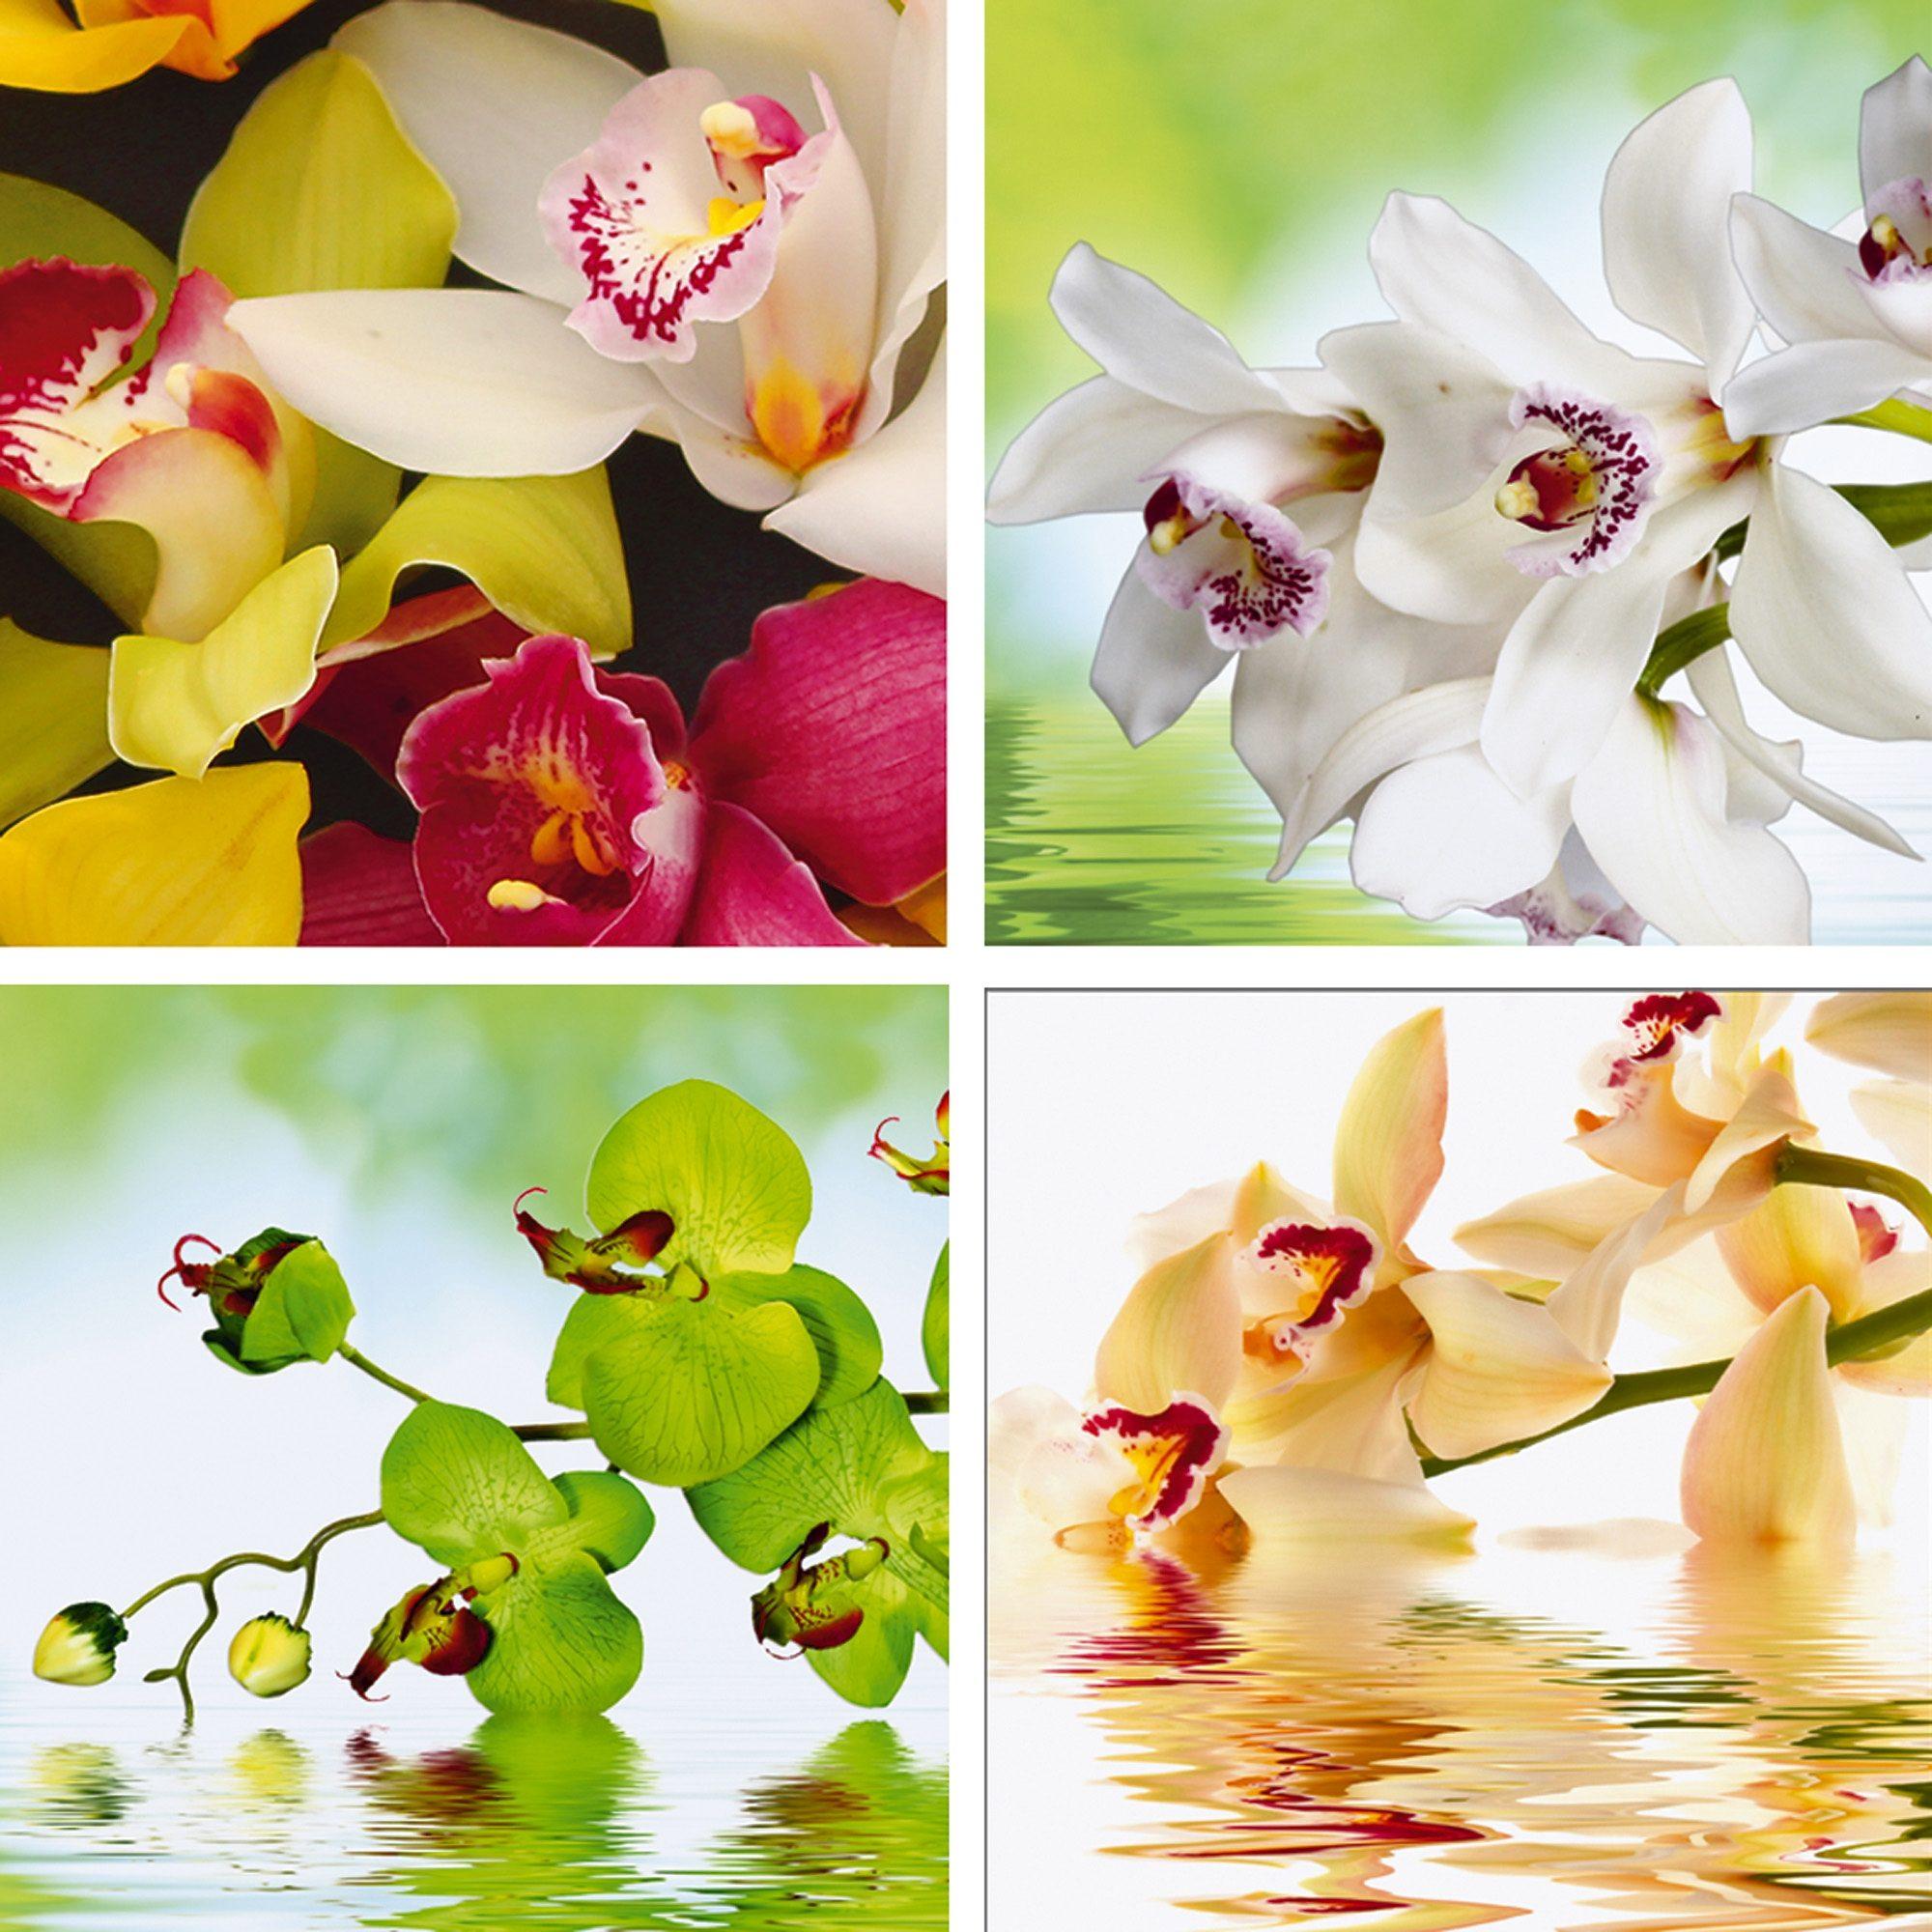 Home affaire Leinwandbild »Meer von Orchideen«, Blumen (Set), 4x 30/30 cm